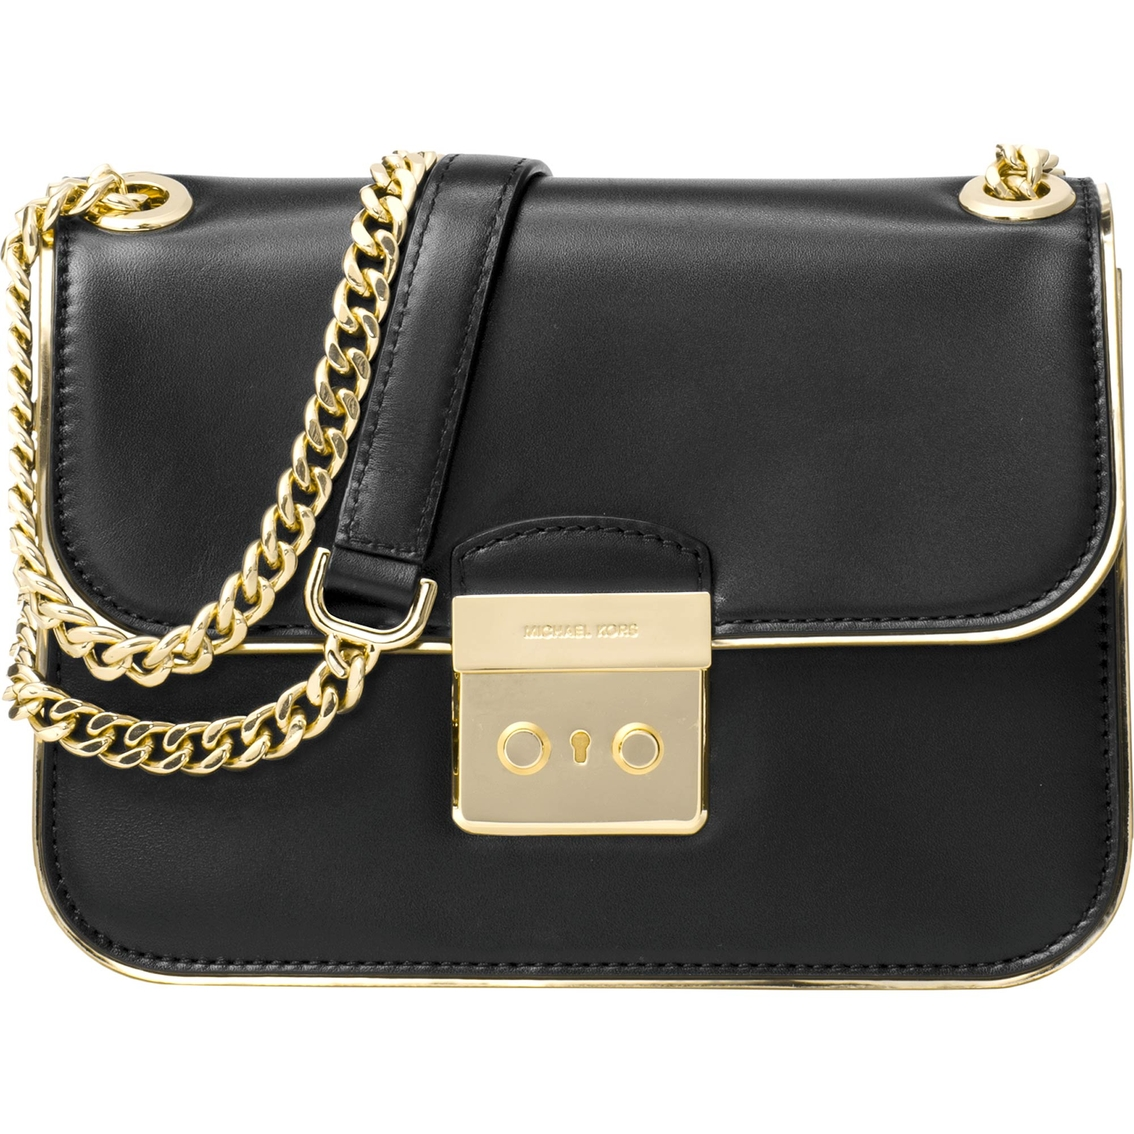 8c626349e9f Michael Kors Sloan Editor Medium Chain Shoulder Bag